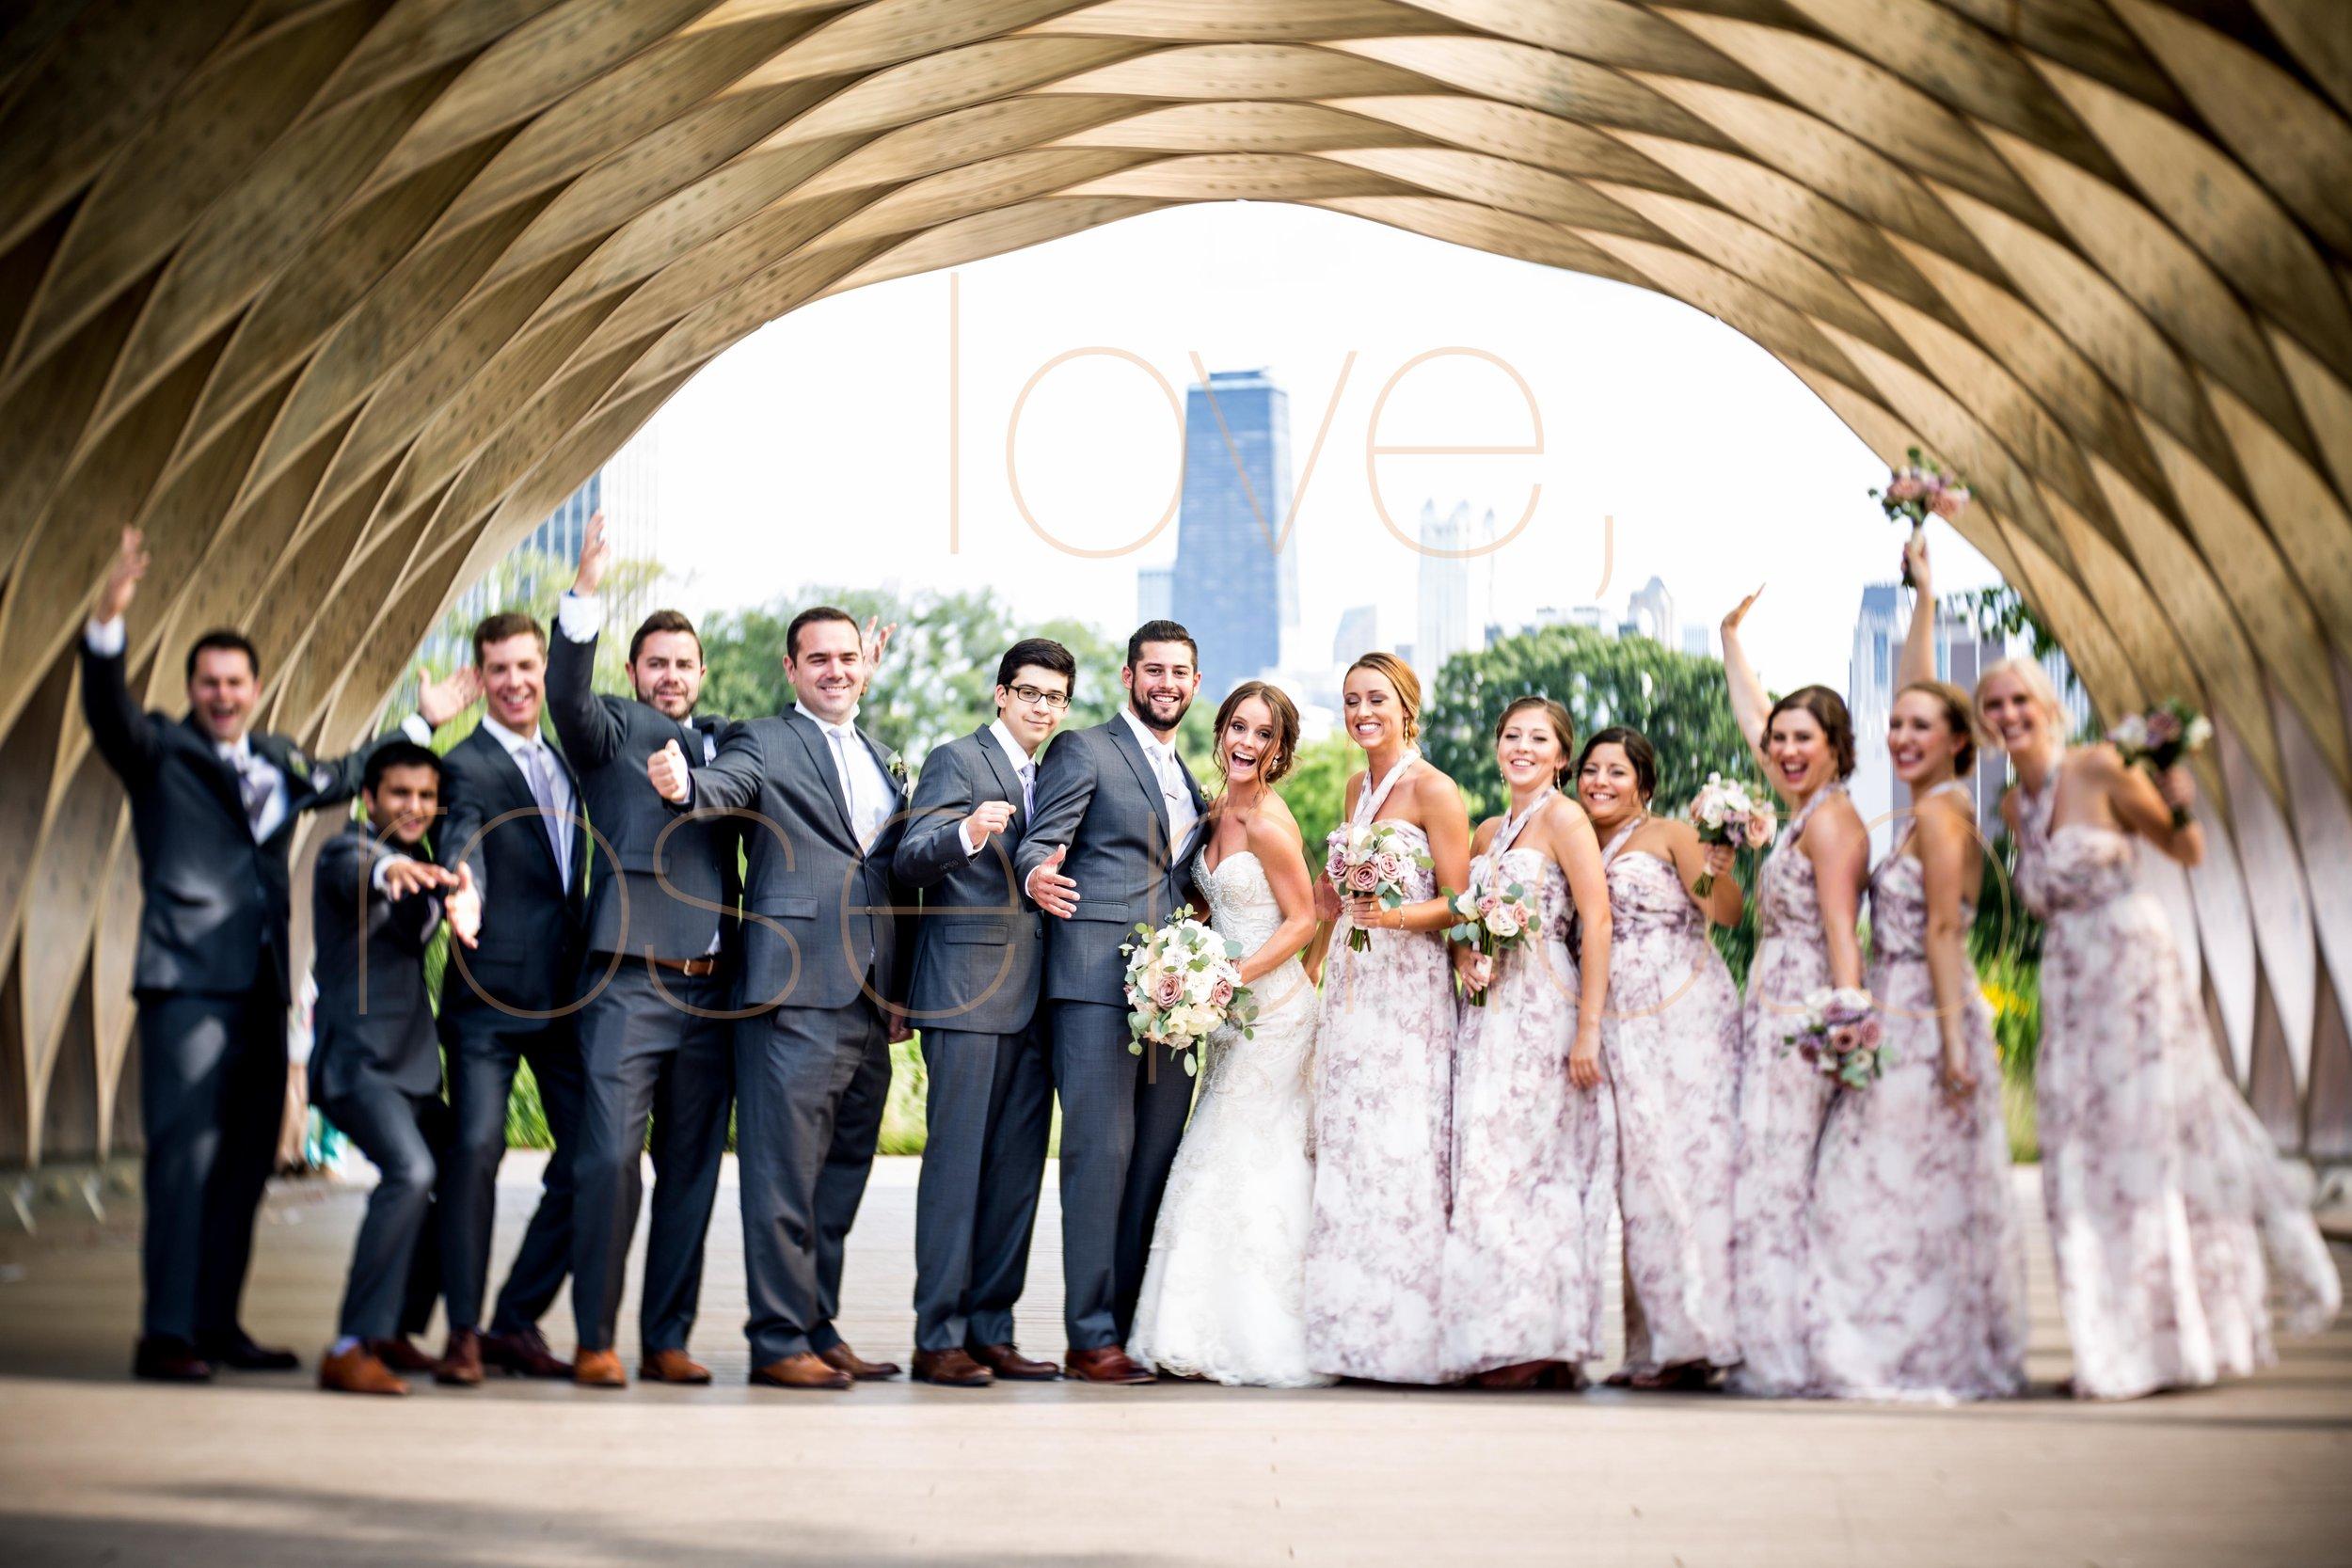 Justine + Matt big day downtown Chicago River Roast wedding by Rose Photo-24.jpg